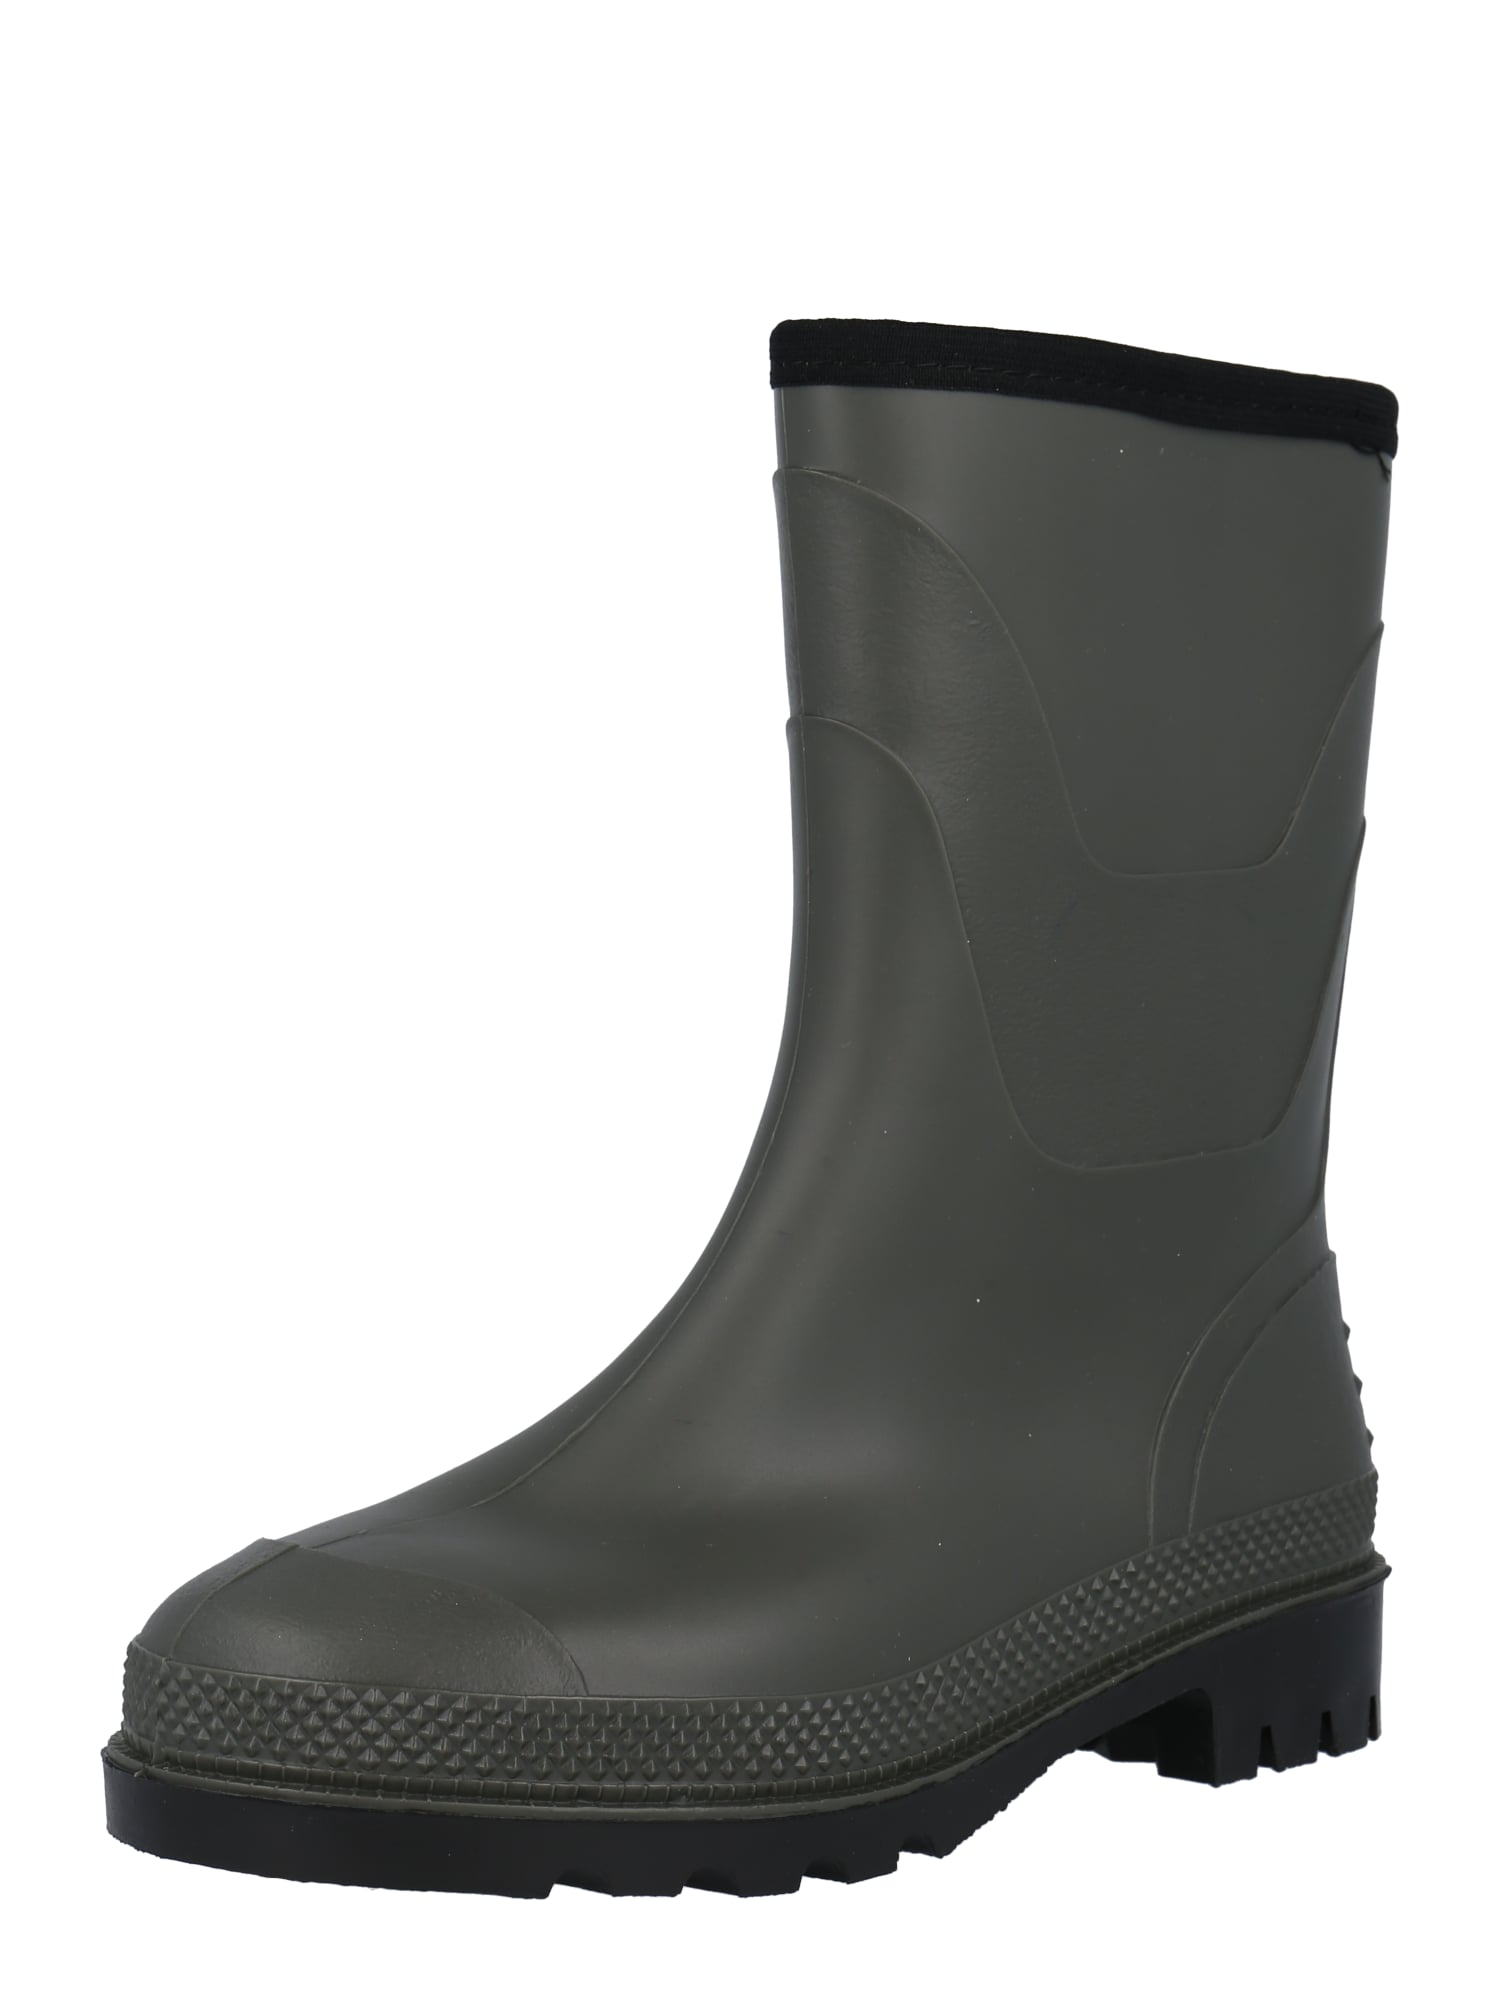 BECK Guminiai batai rusvai žalia